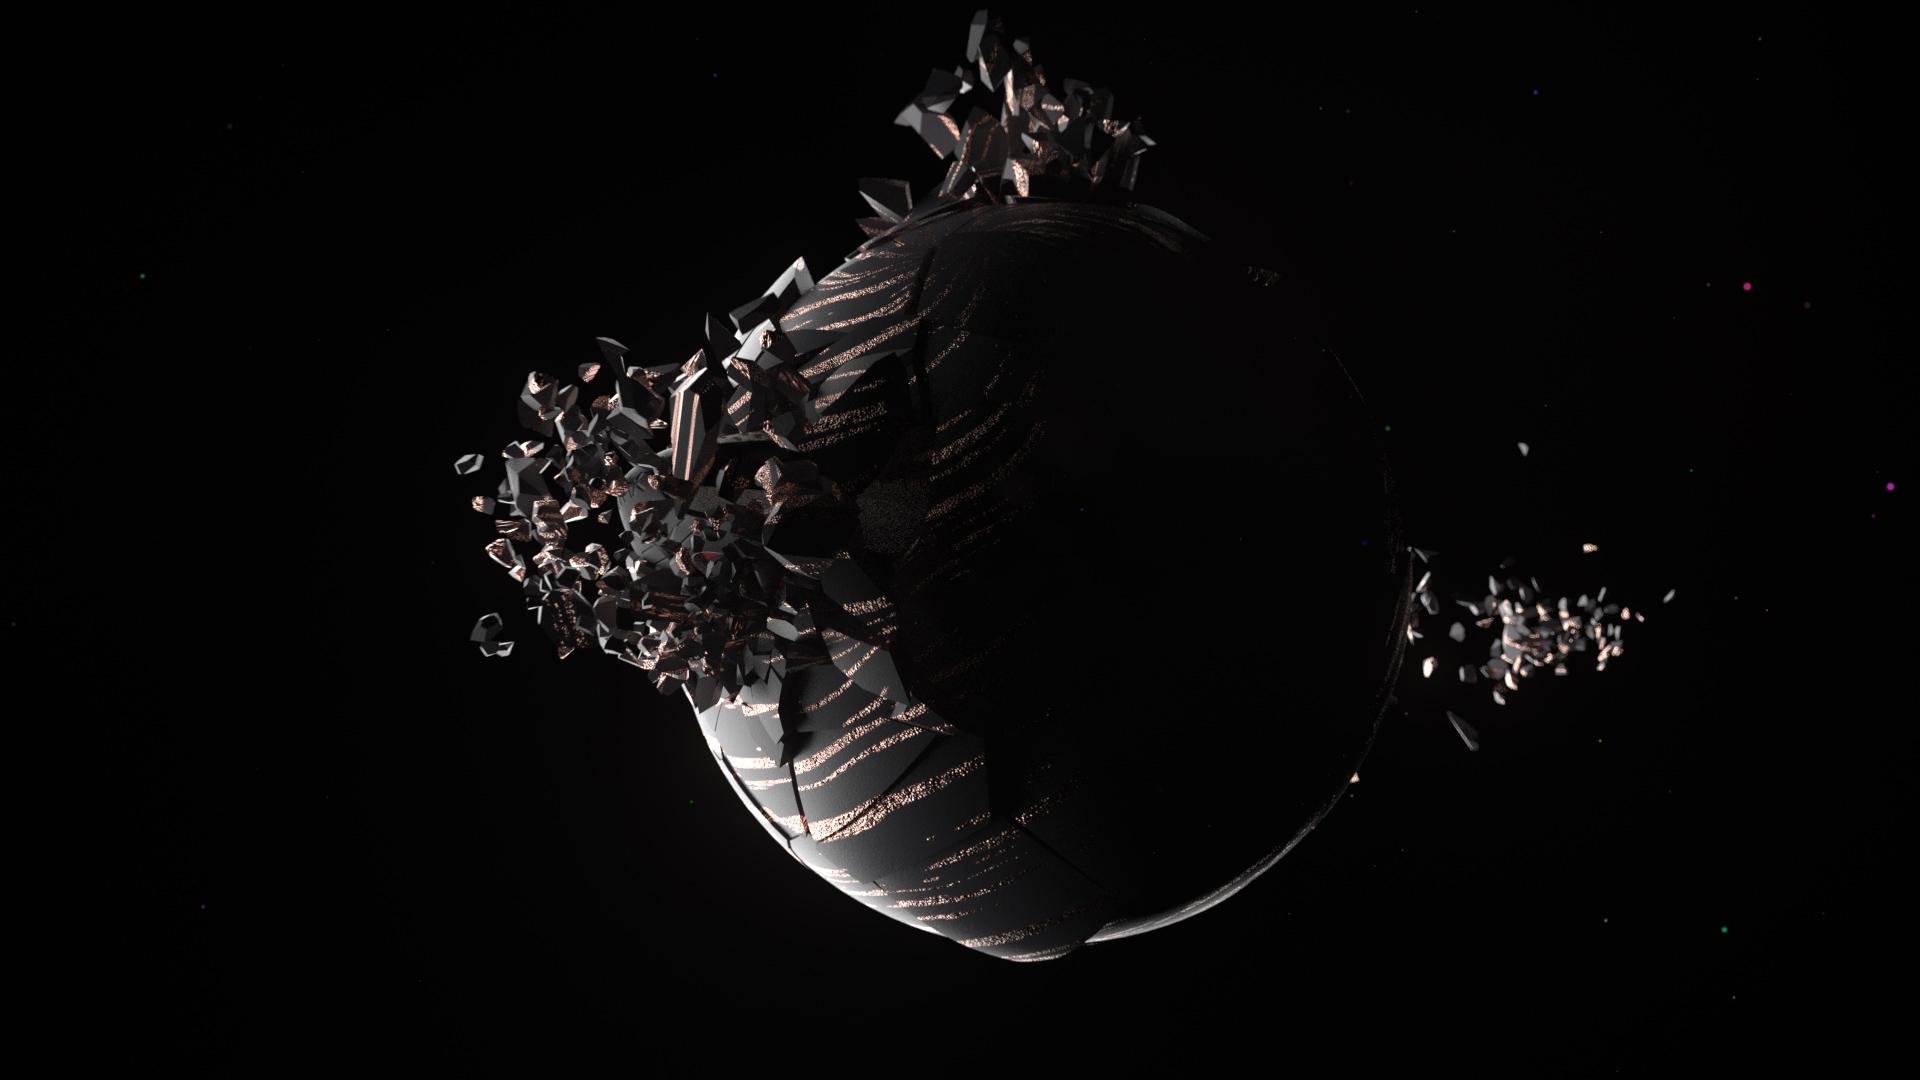 Nike-Air-Max-270_particles_Emanuele_Serra_1